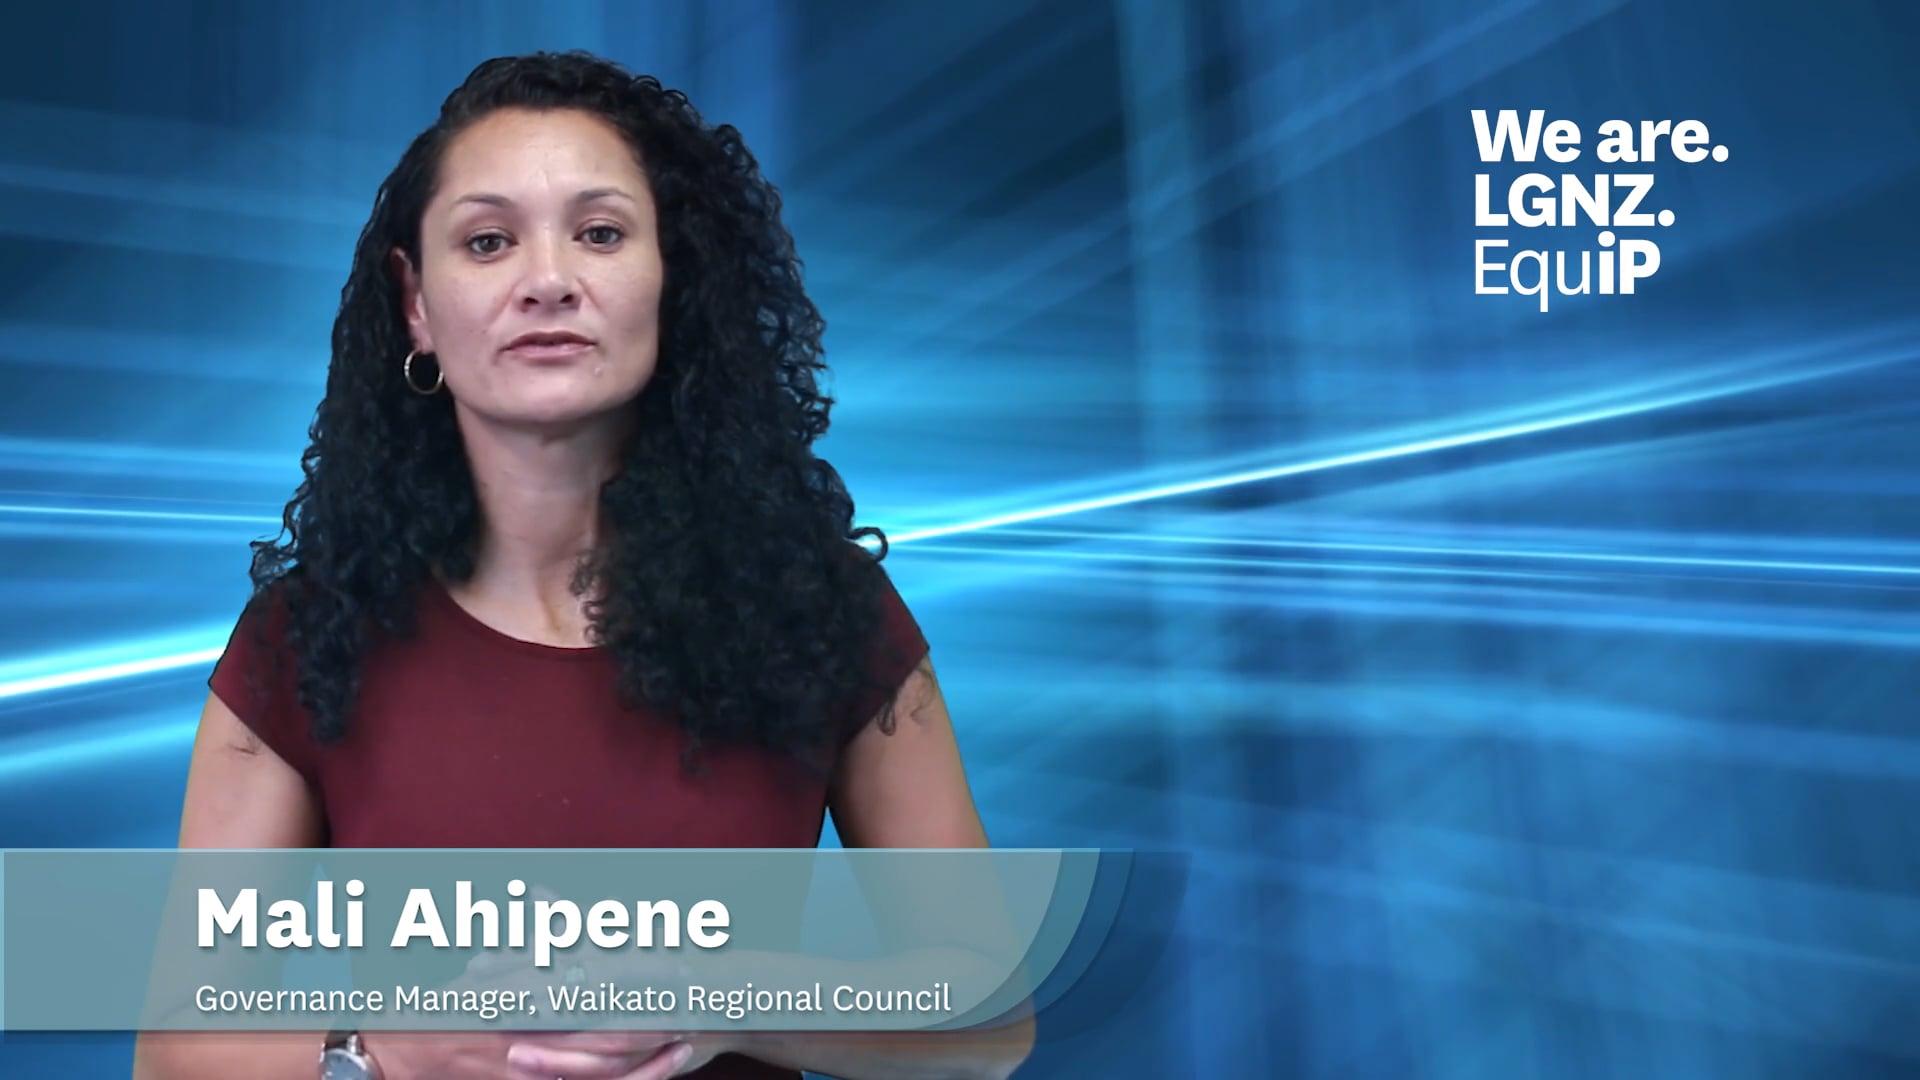 Nomination requirements - with Mali Apihene